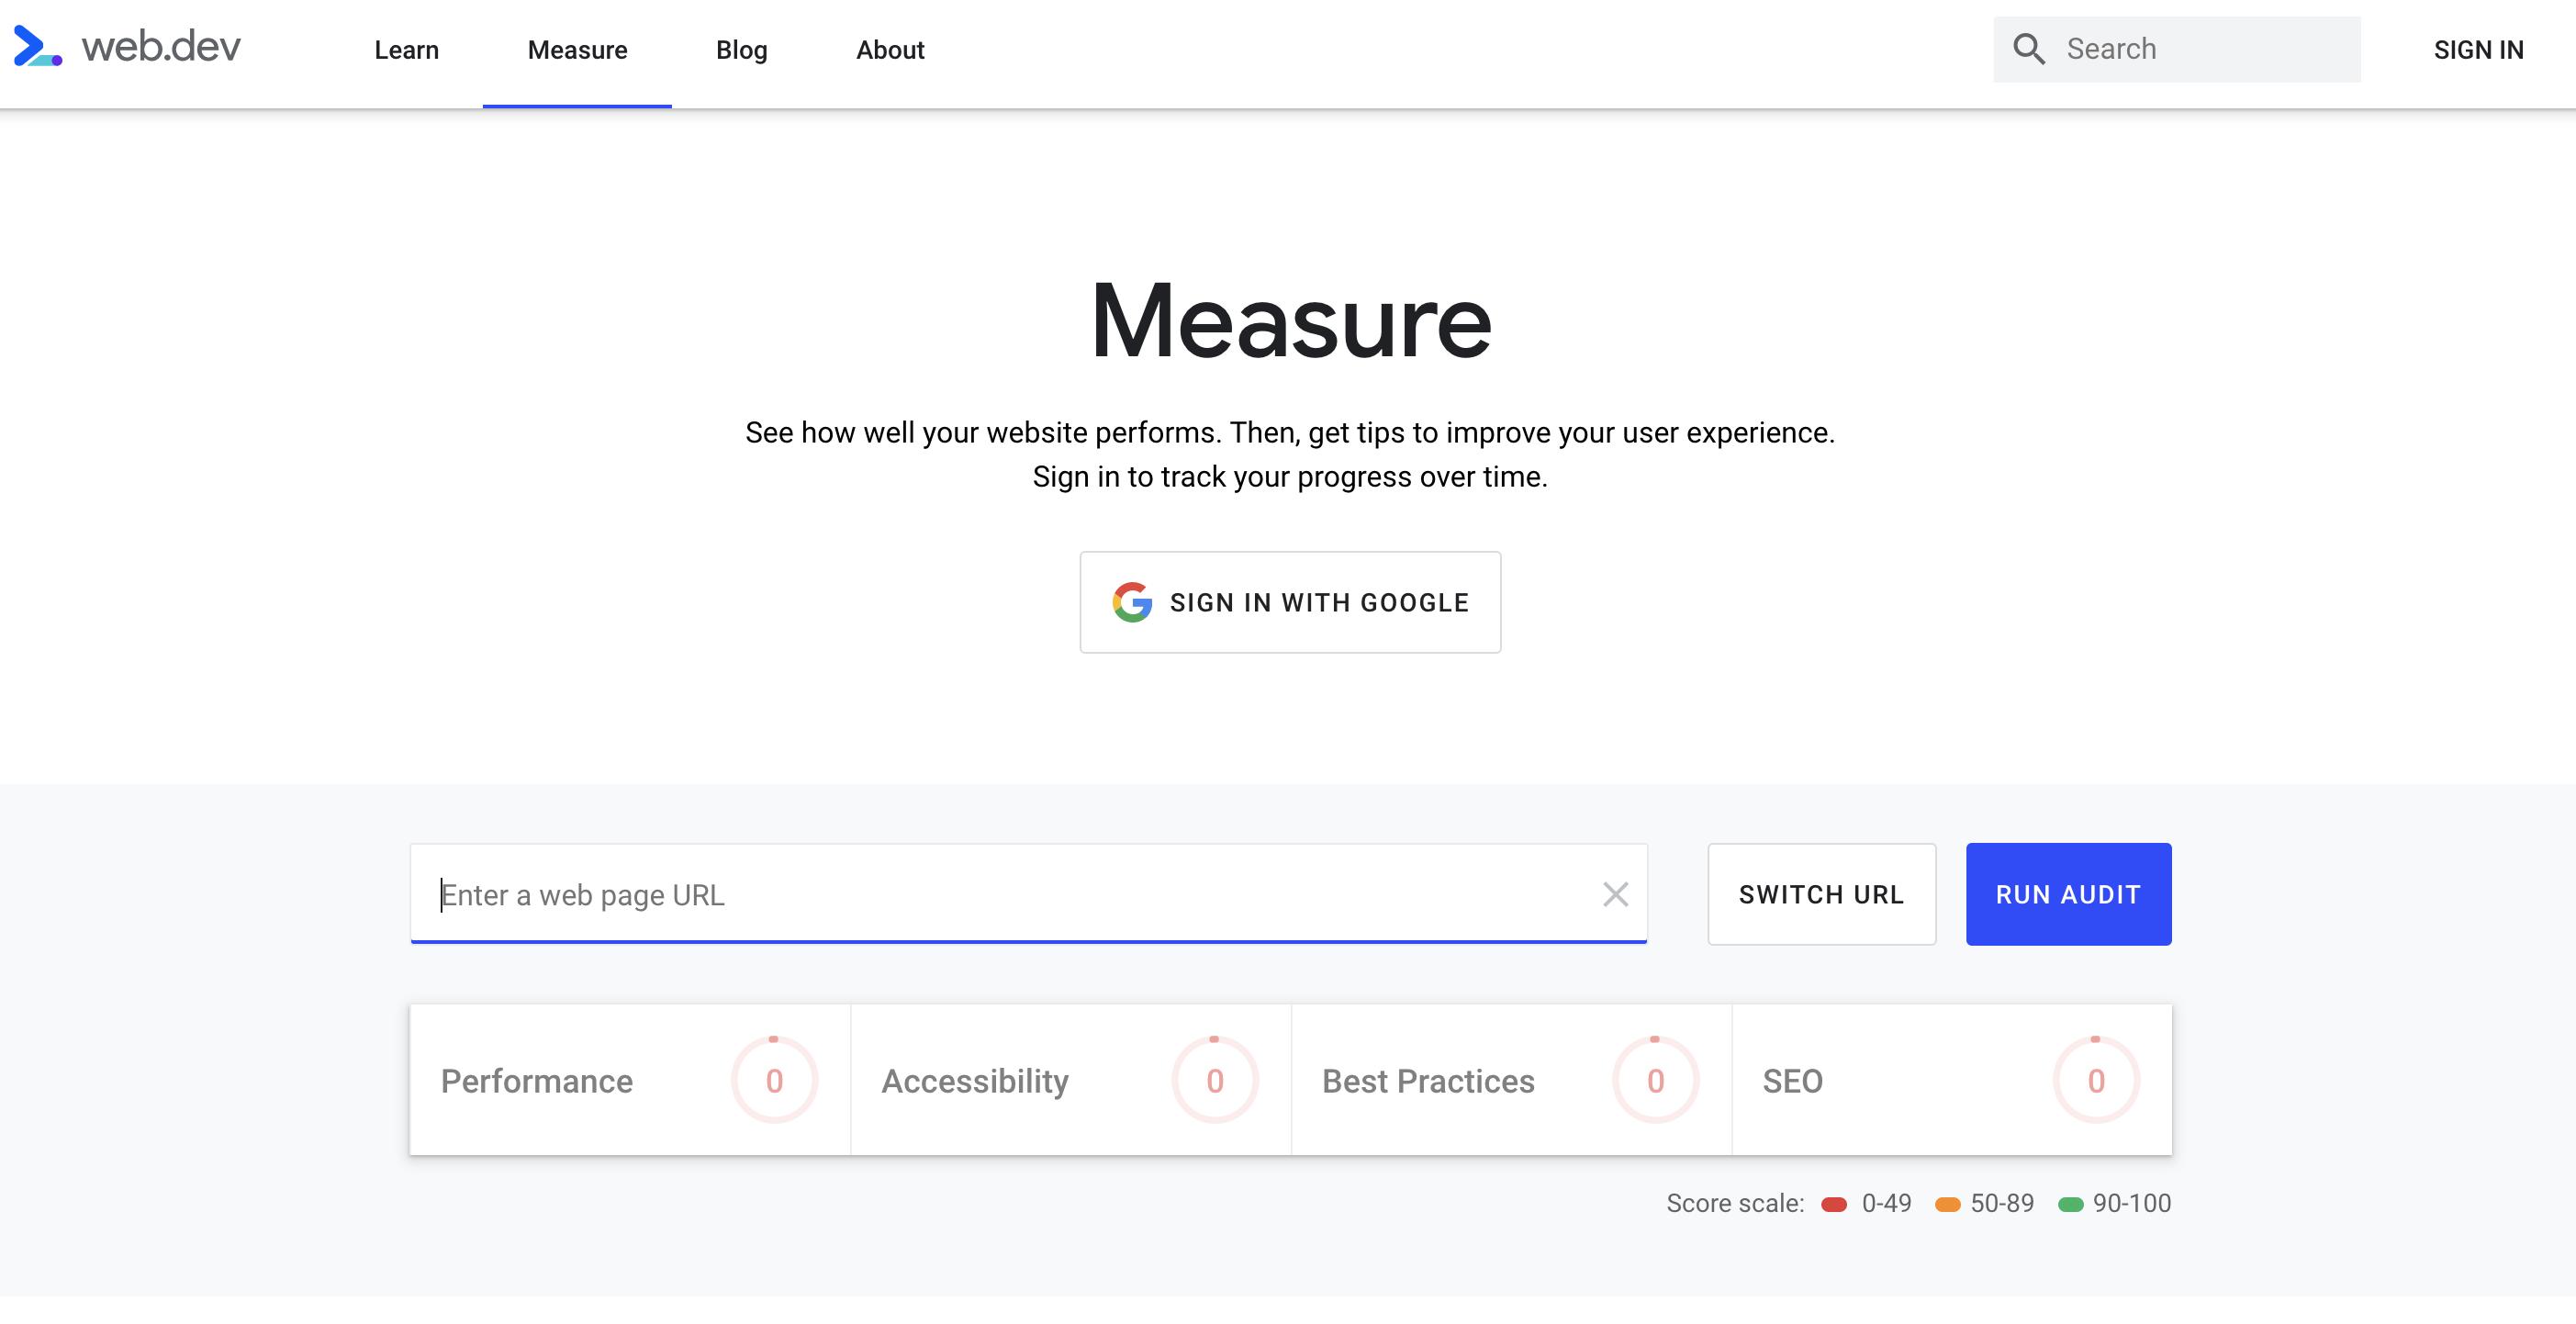 https://web.dev/measure